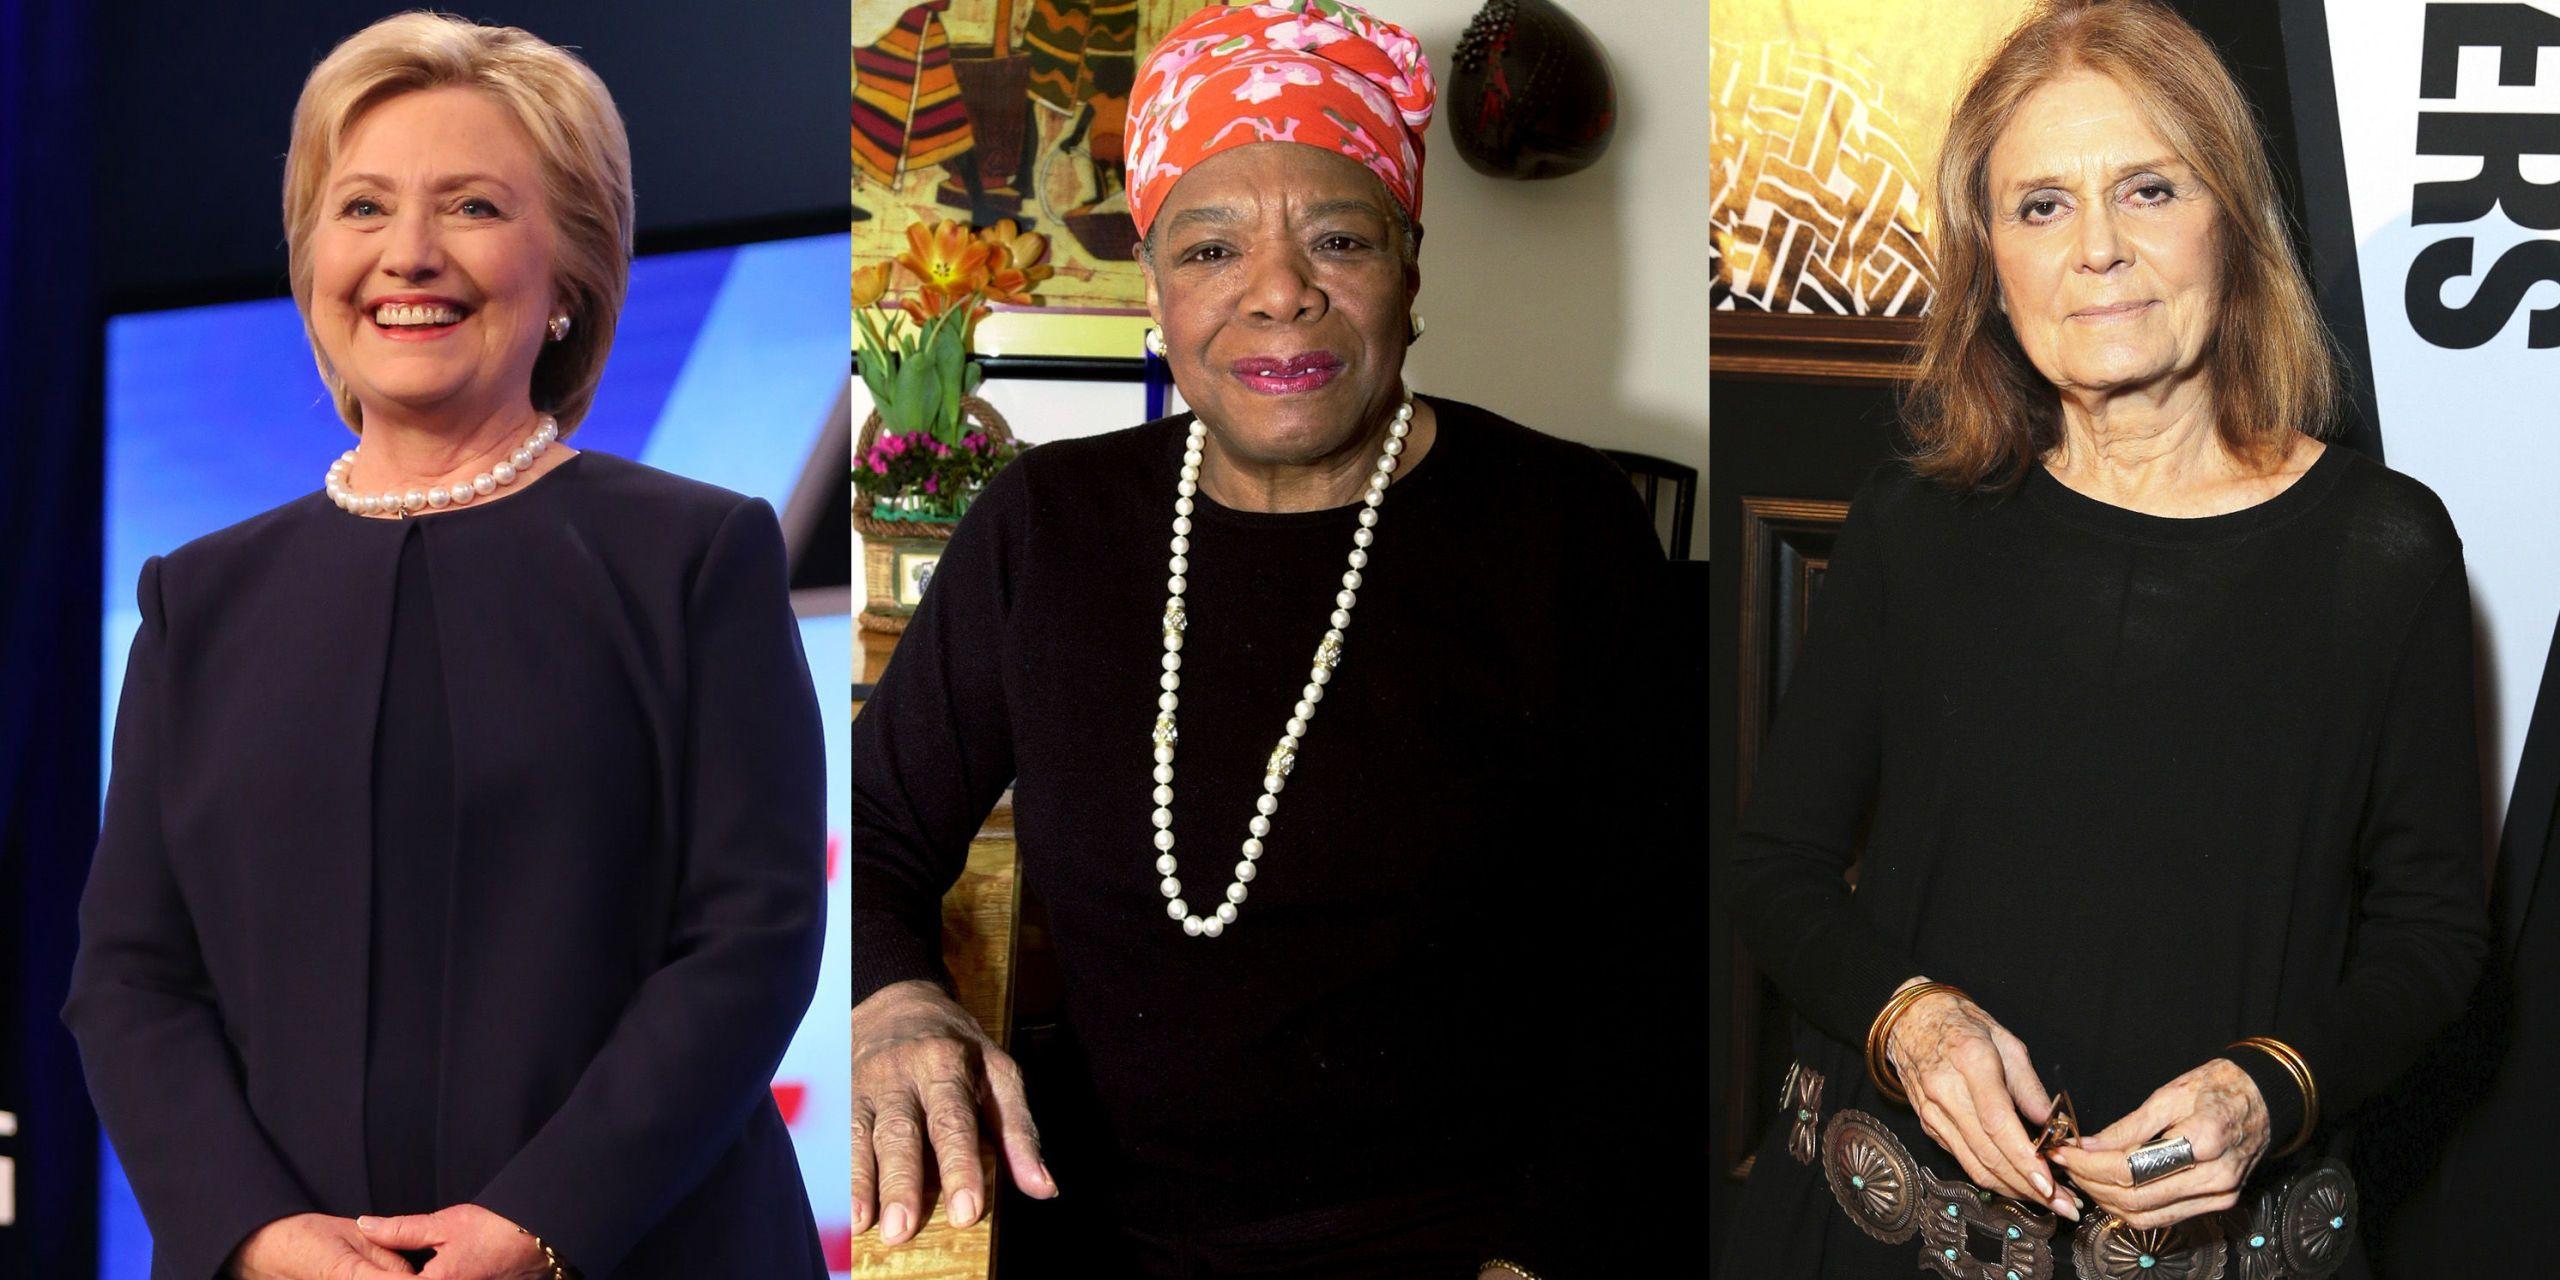 35 Empowering Feminist Quotes from Inspiring Women